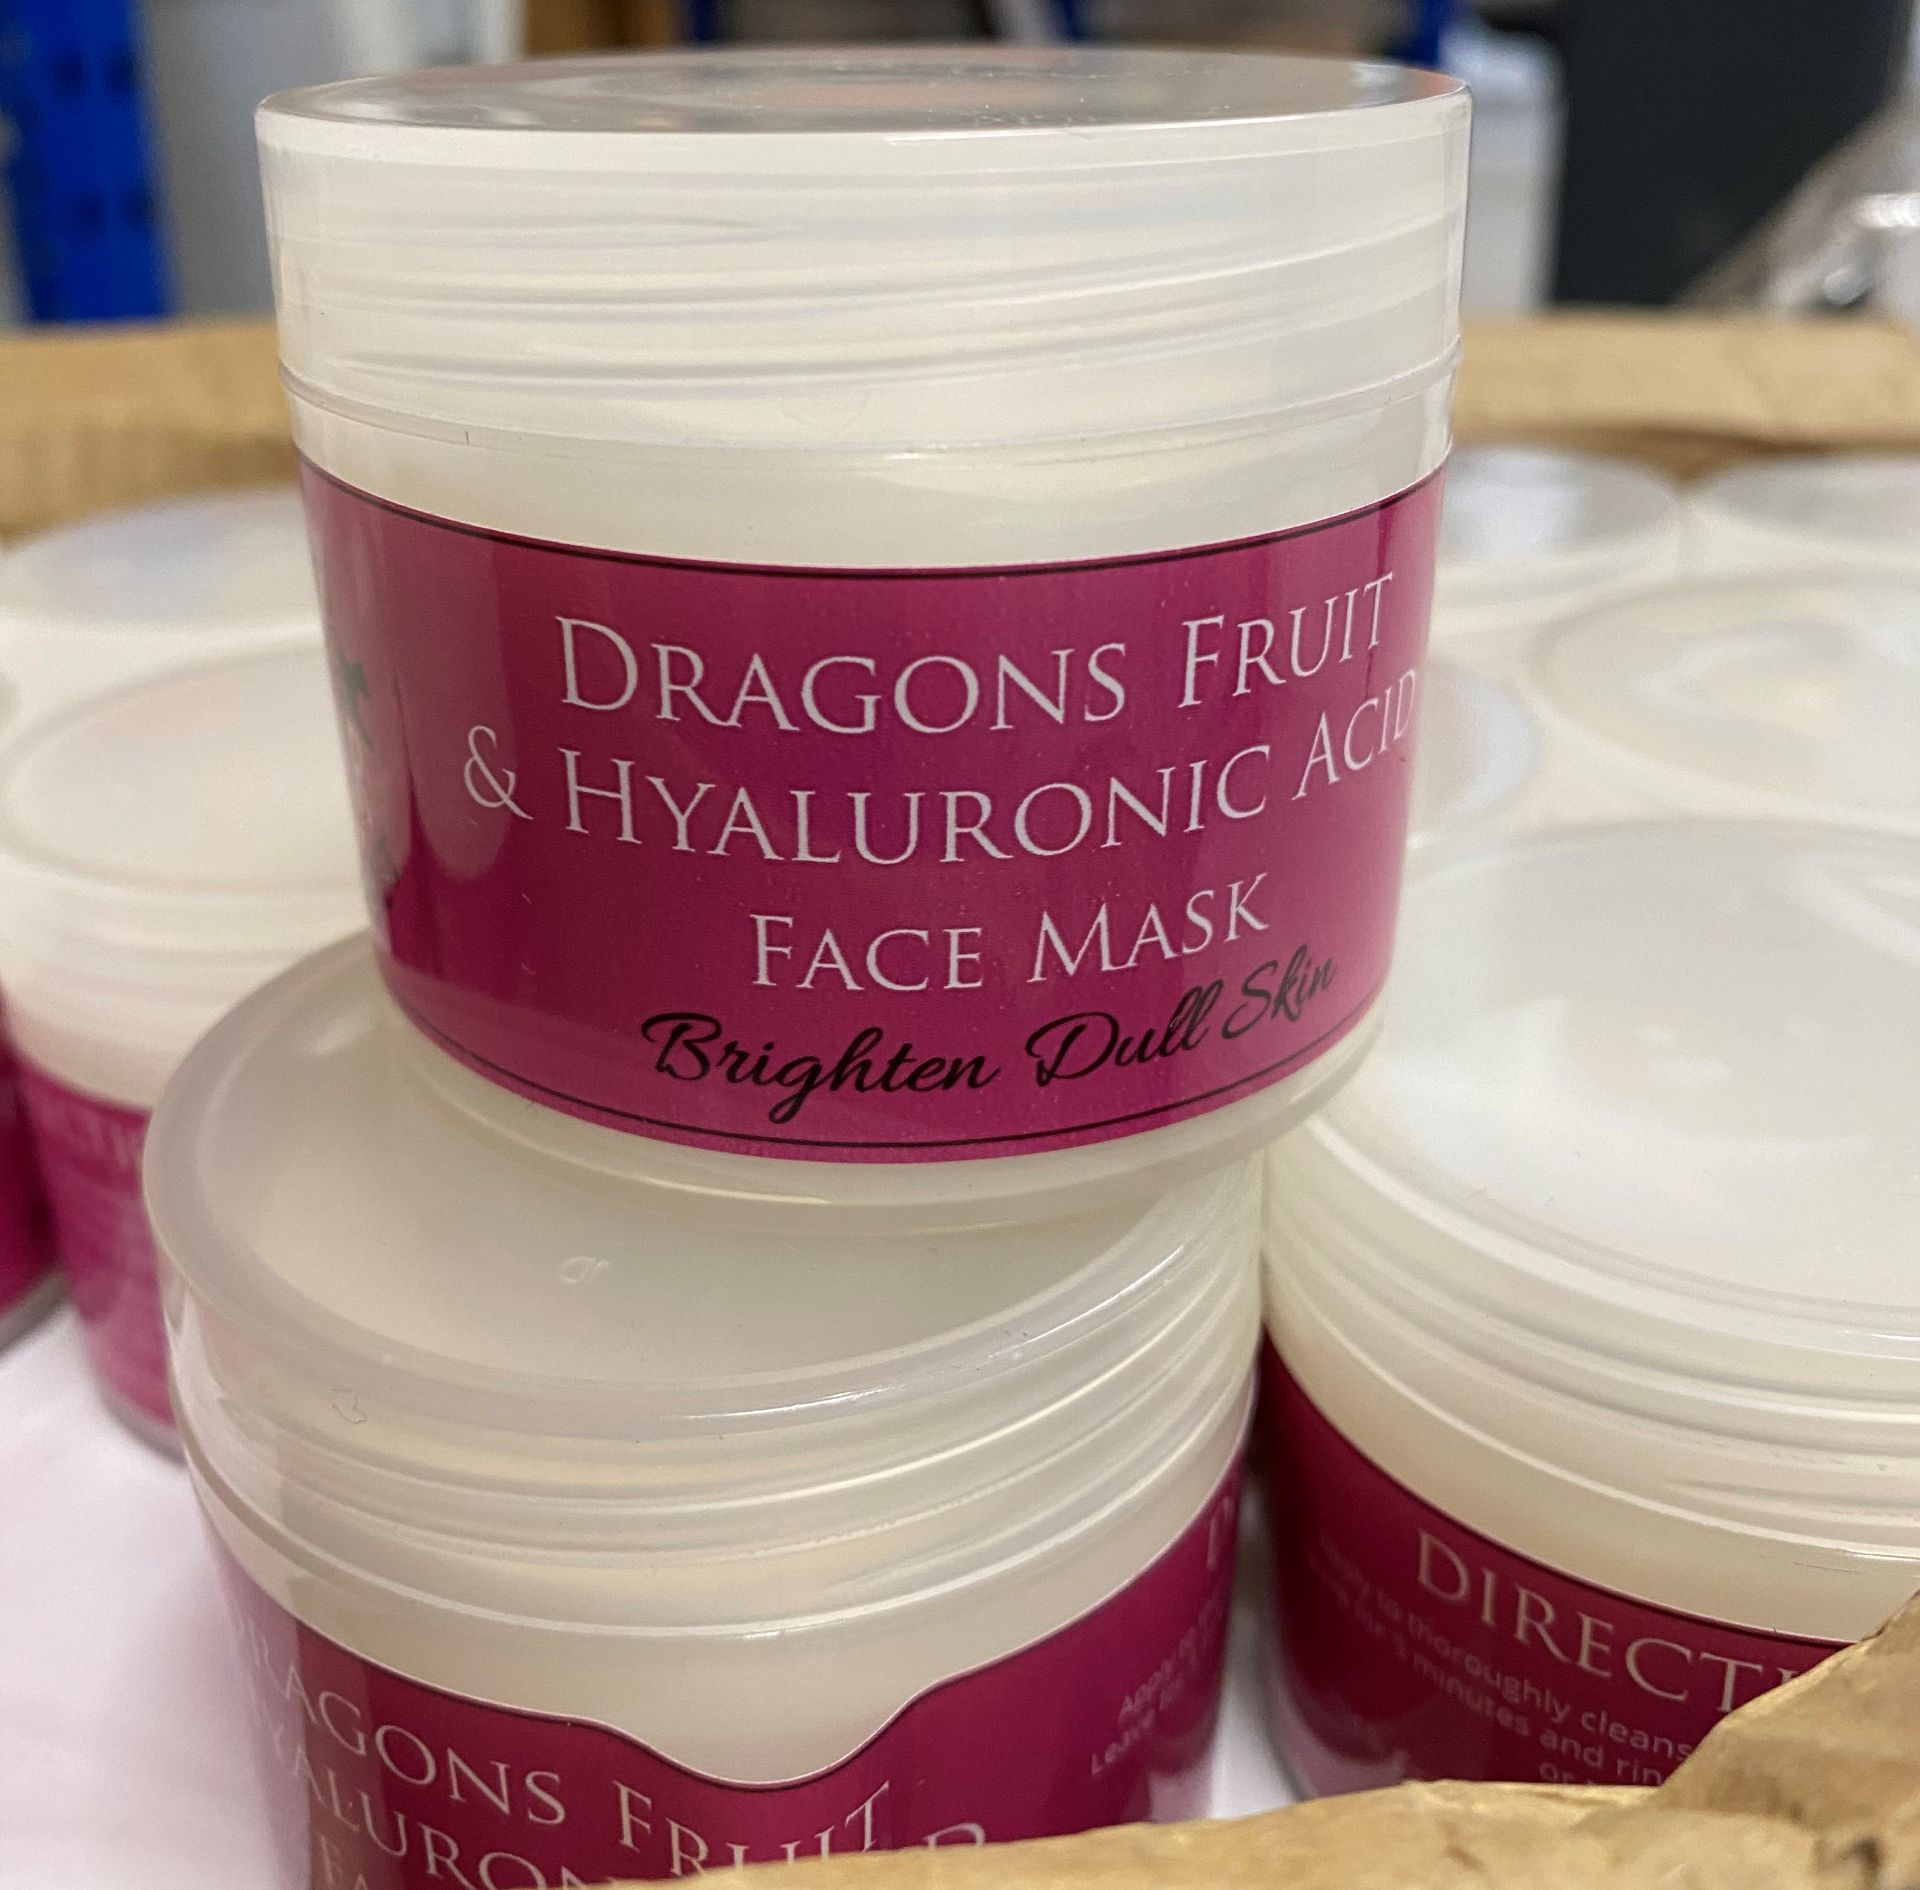 50 x 100ml pots of Cougar Dragons Fruit & Hyaluronic Acid Face Mask